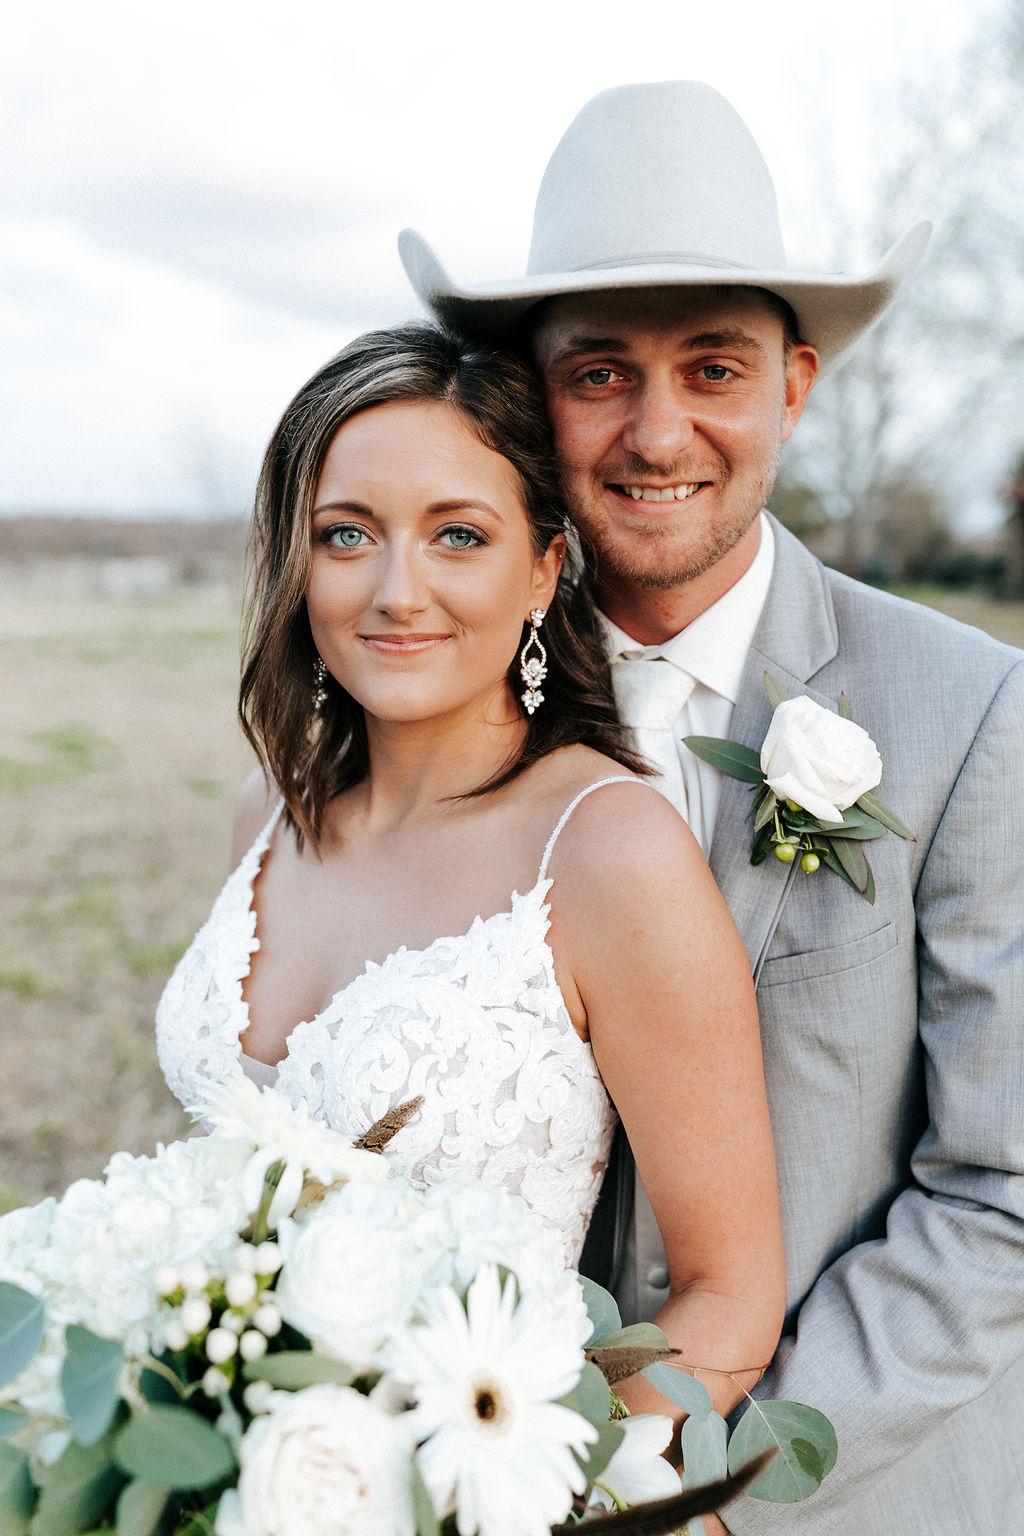 Epoch Co+ Destination wedding planner | First Look Photo Ideas with Groom | Bridal Makeup Hairstyle Jewlery Bouquet Boutonniere | Velvet + Wire Photography | Austin Wedding Planner